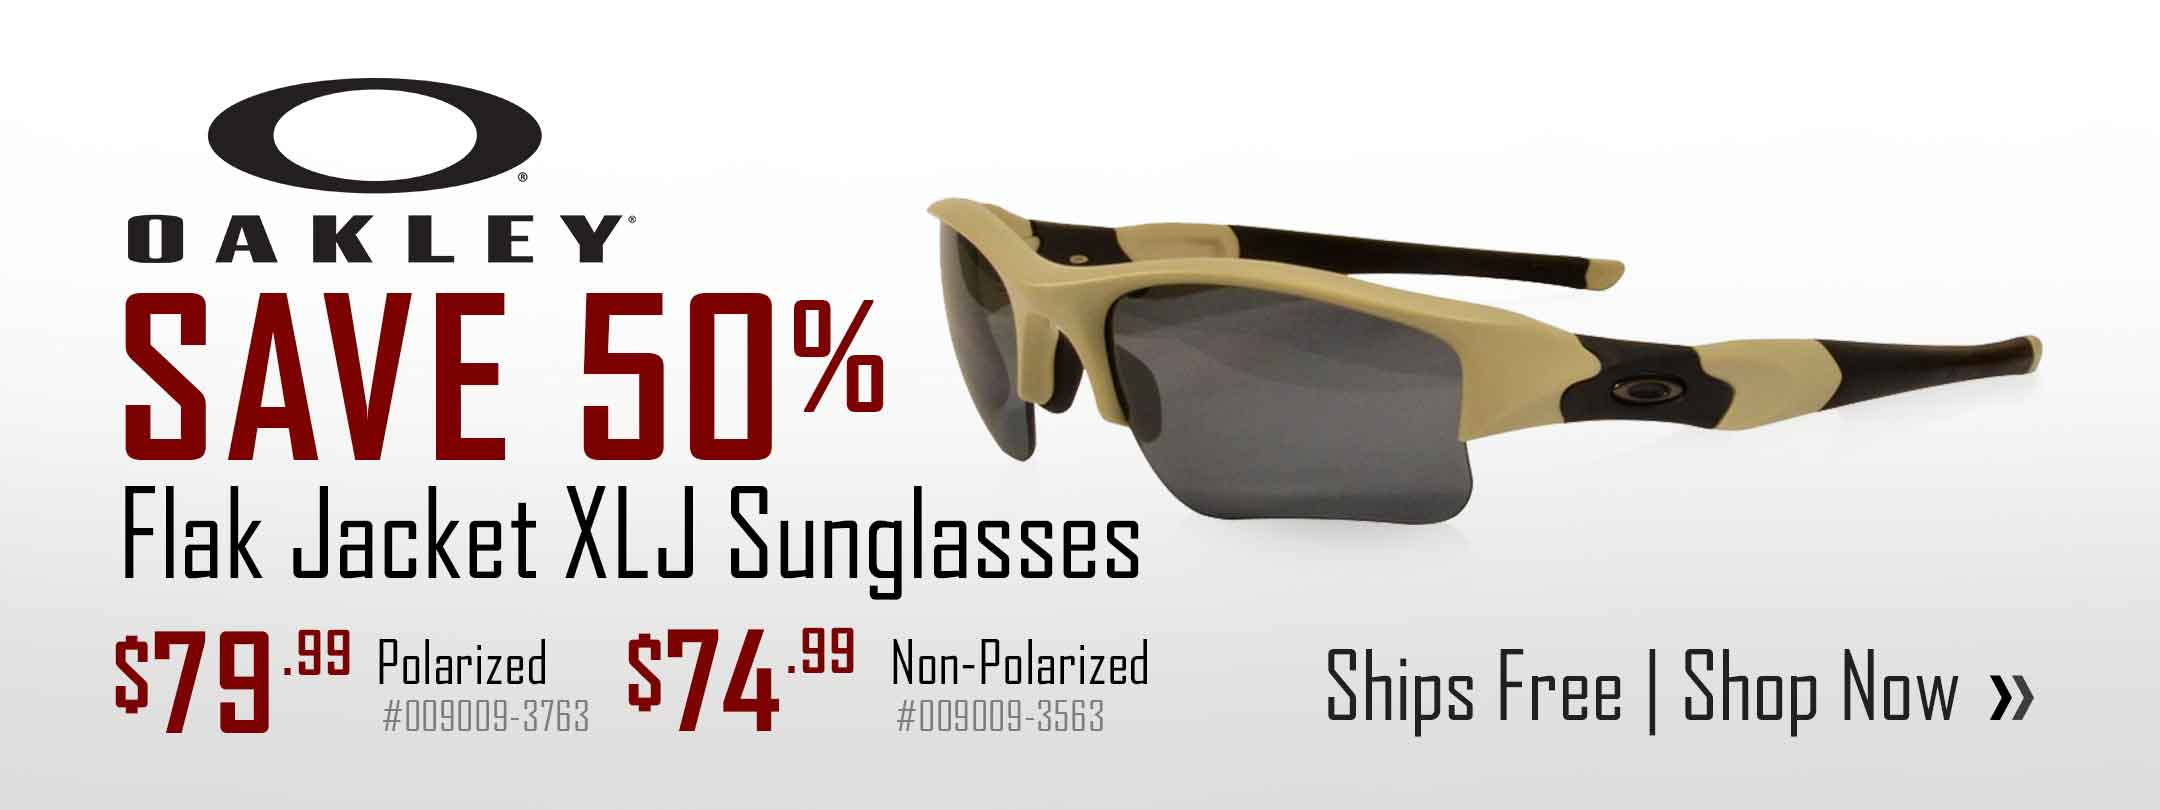 MidwayUSA Exclusive - Save on Oakley Flak Jacket Polarized & Non-Polarized Sunglasses